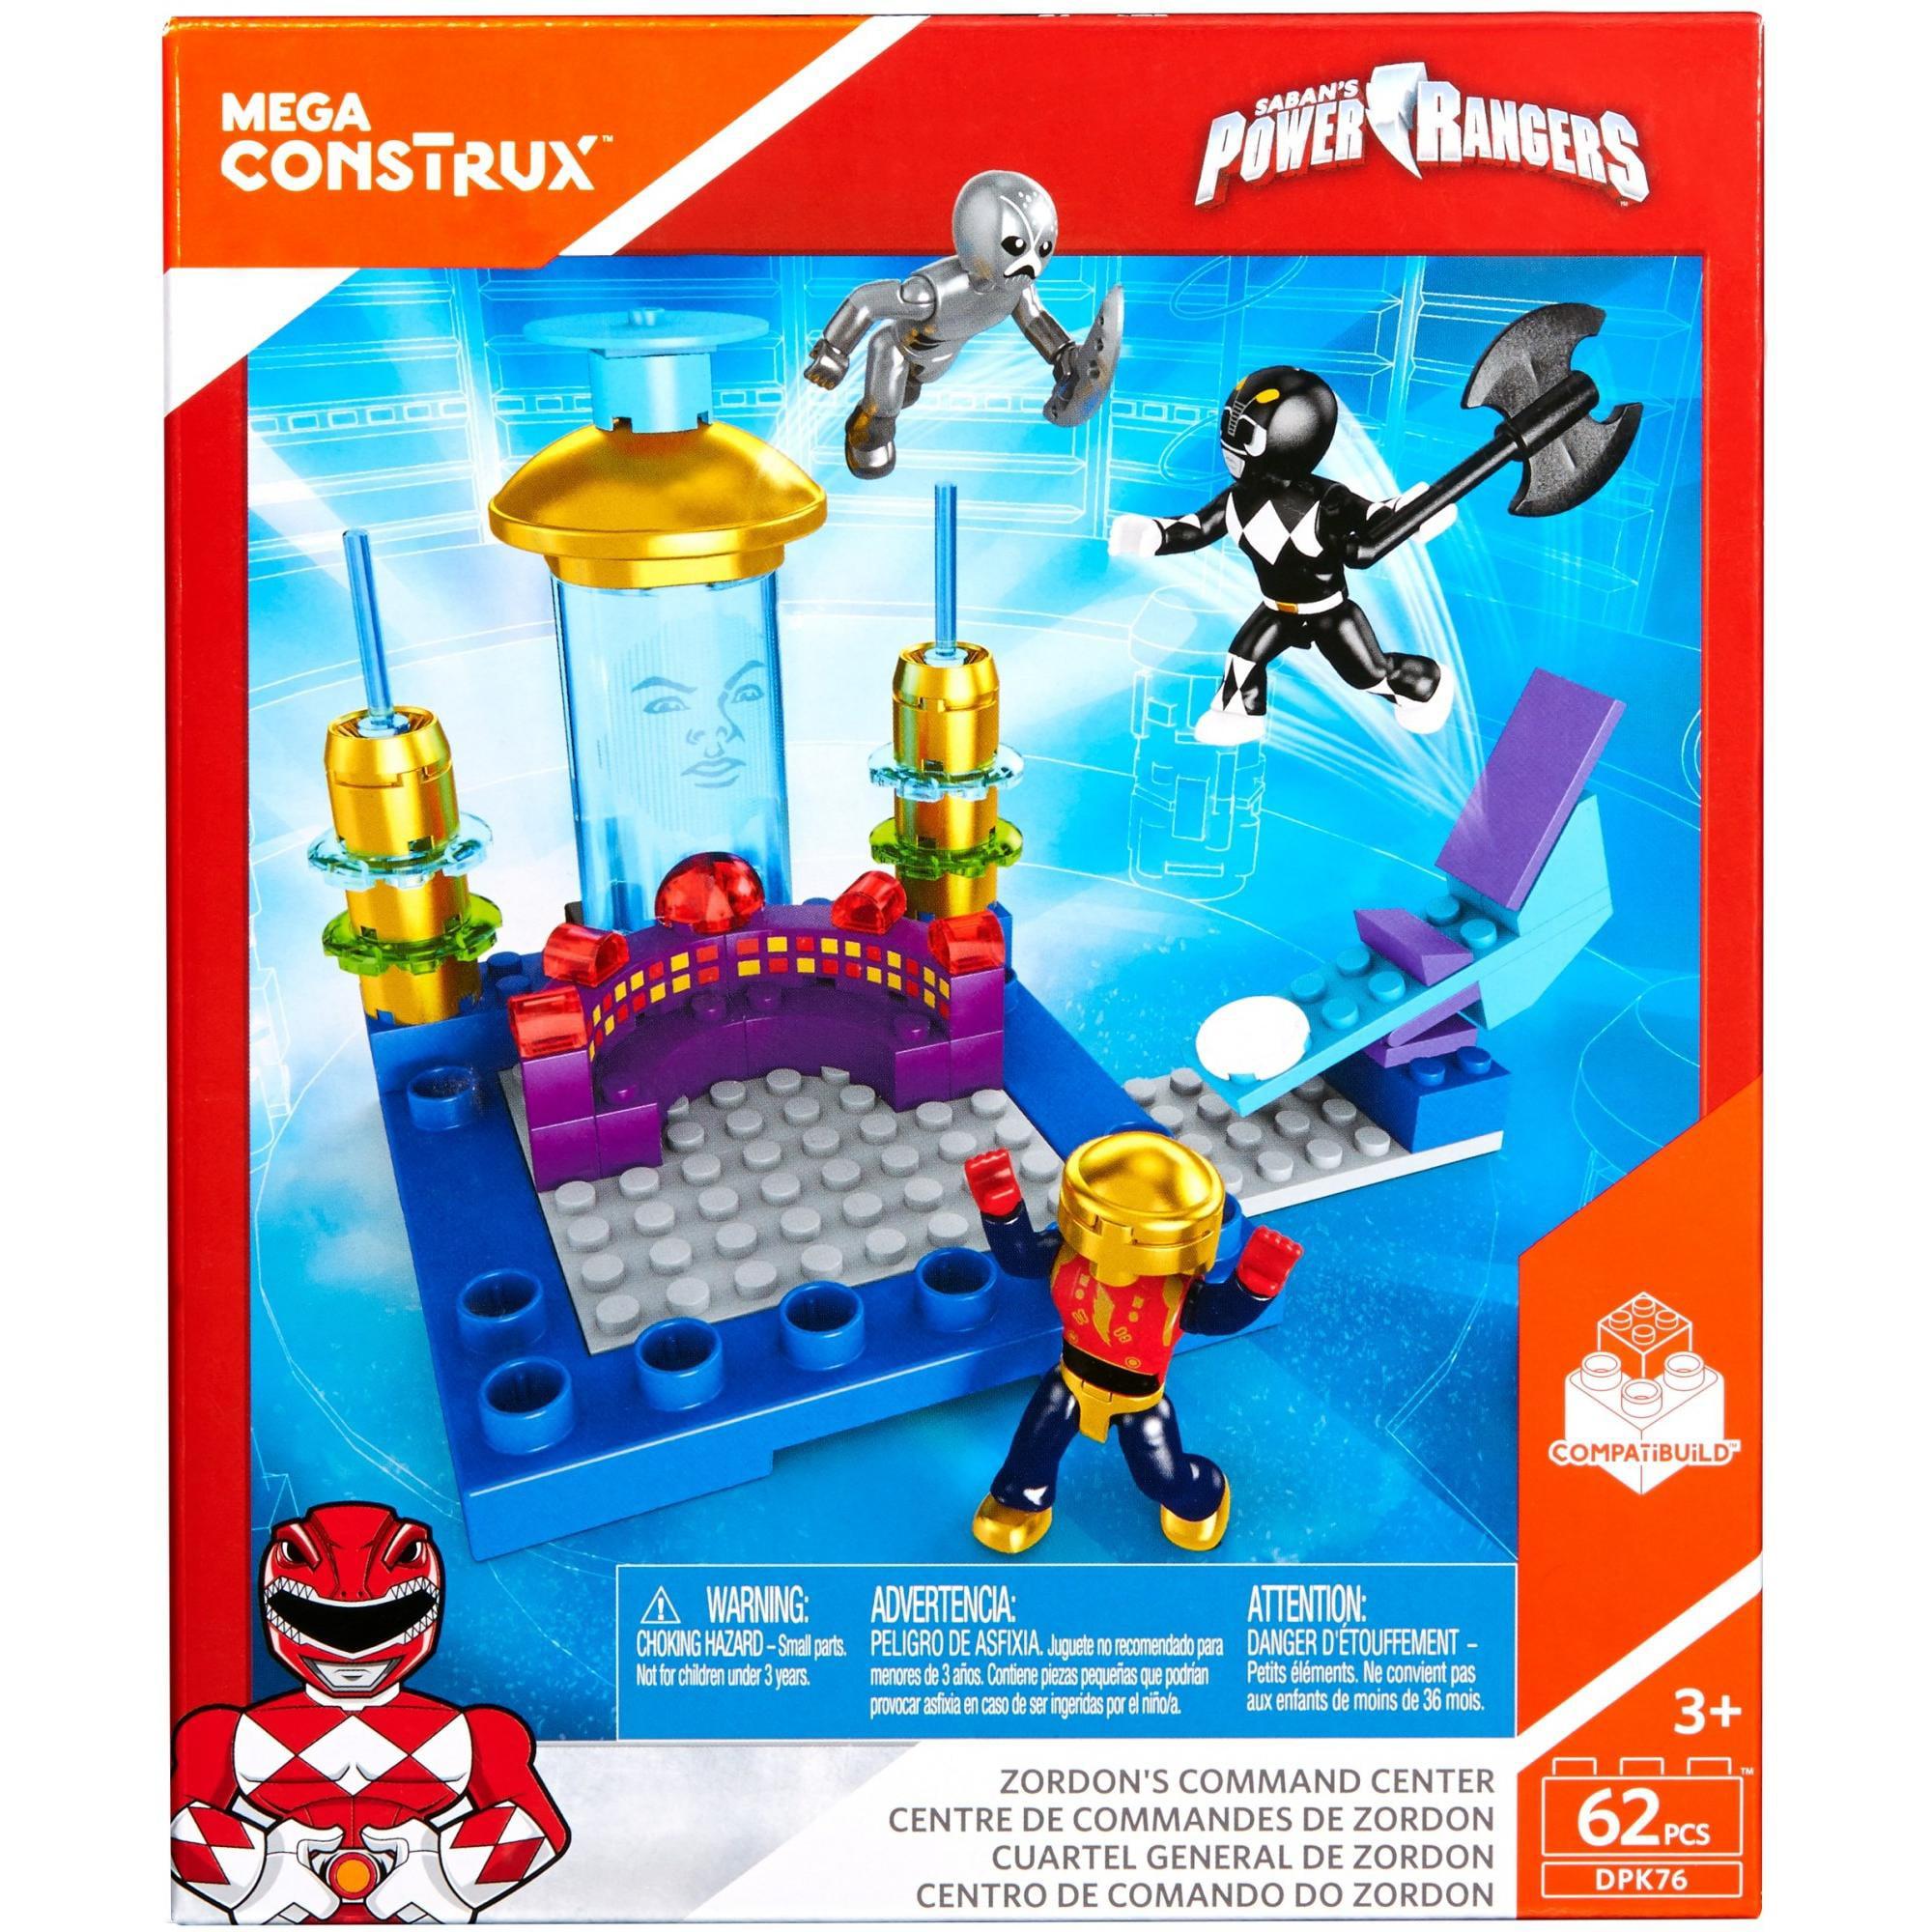 Mega Construx Power Rangers Zordon's Command Center by Mega Construx